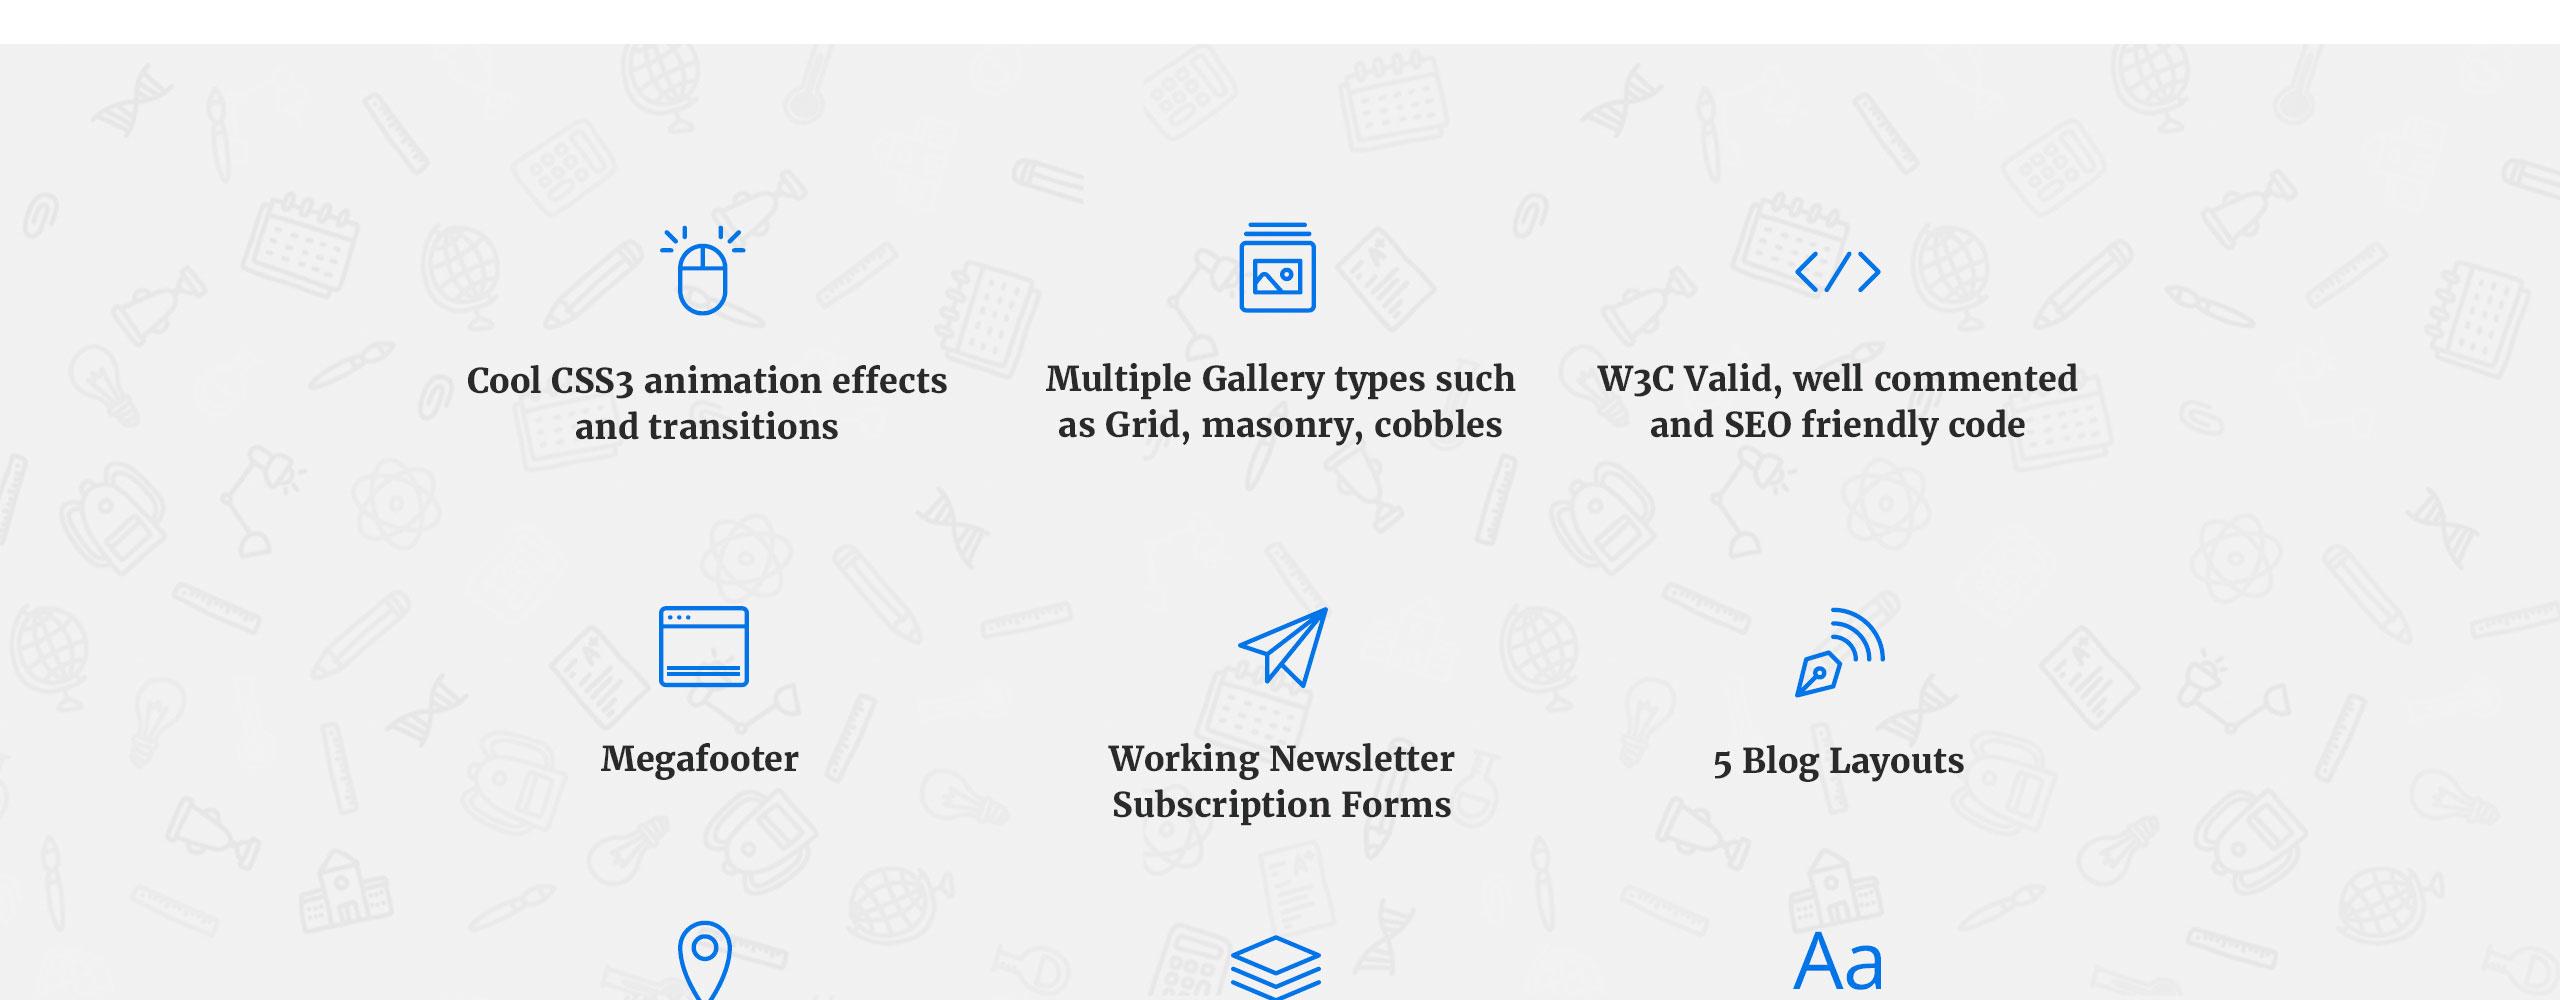 Learner Website Template